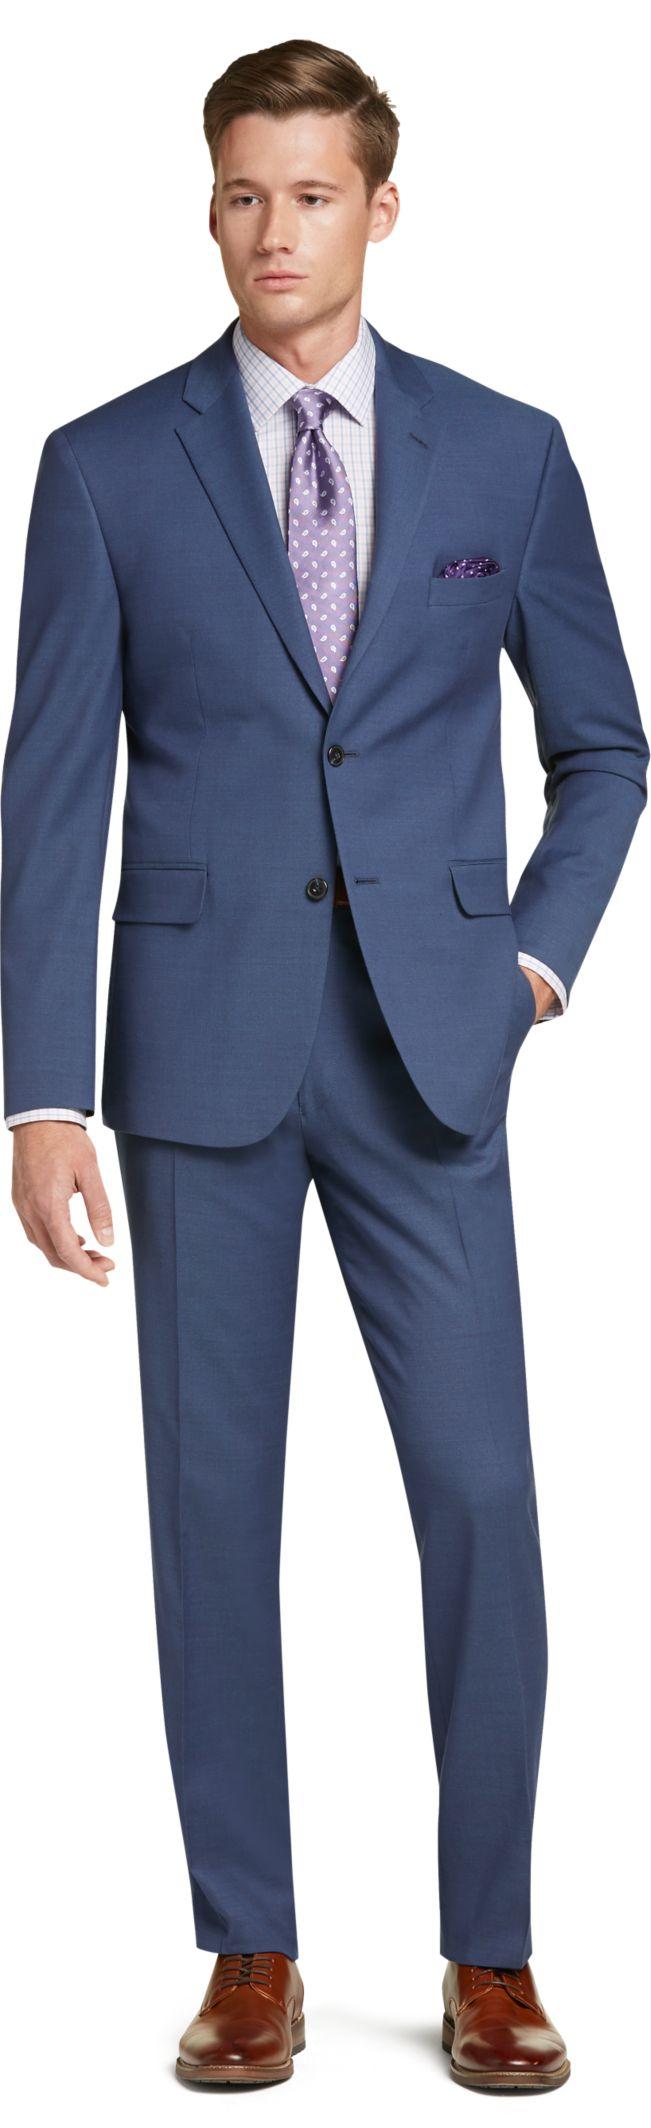 Men's Suits   Black, Navy & Grey Business Suits   JoS. A. Bank